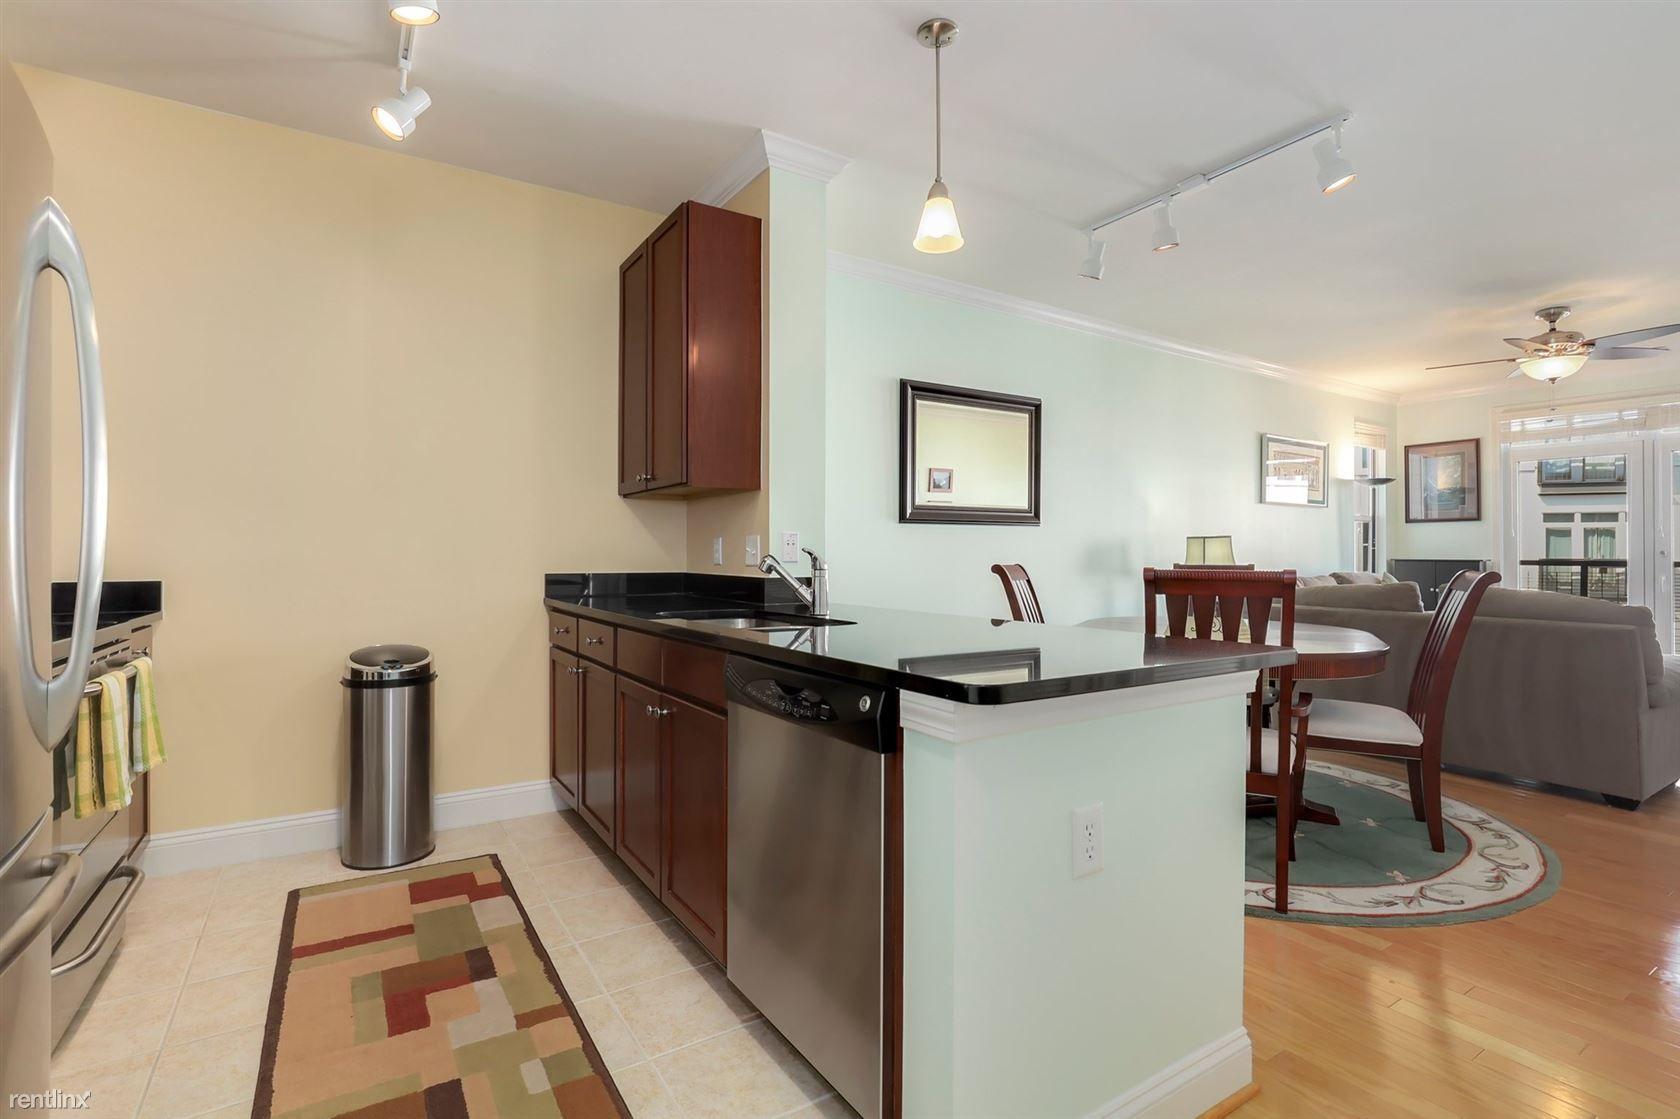 1391 Pennsylvania Ave SE Unit 418 rental